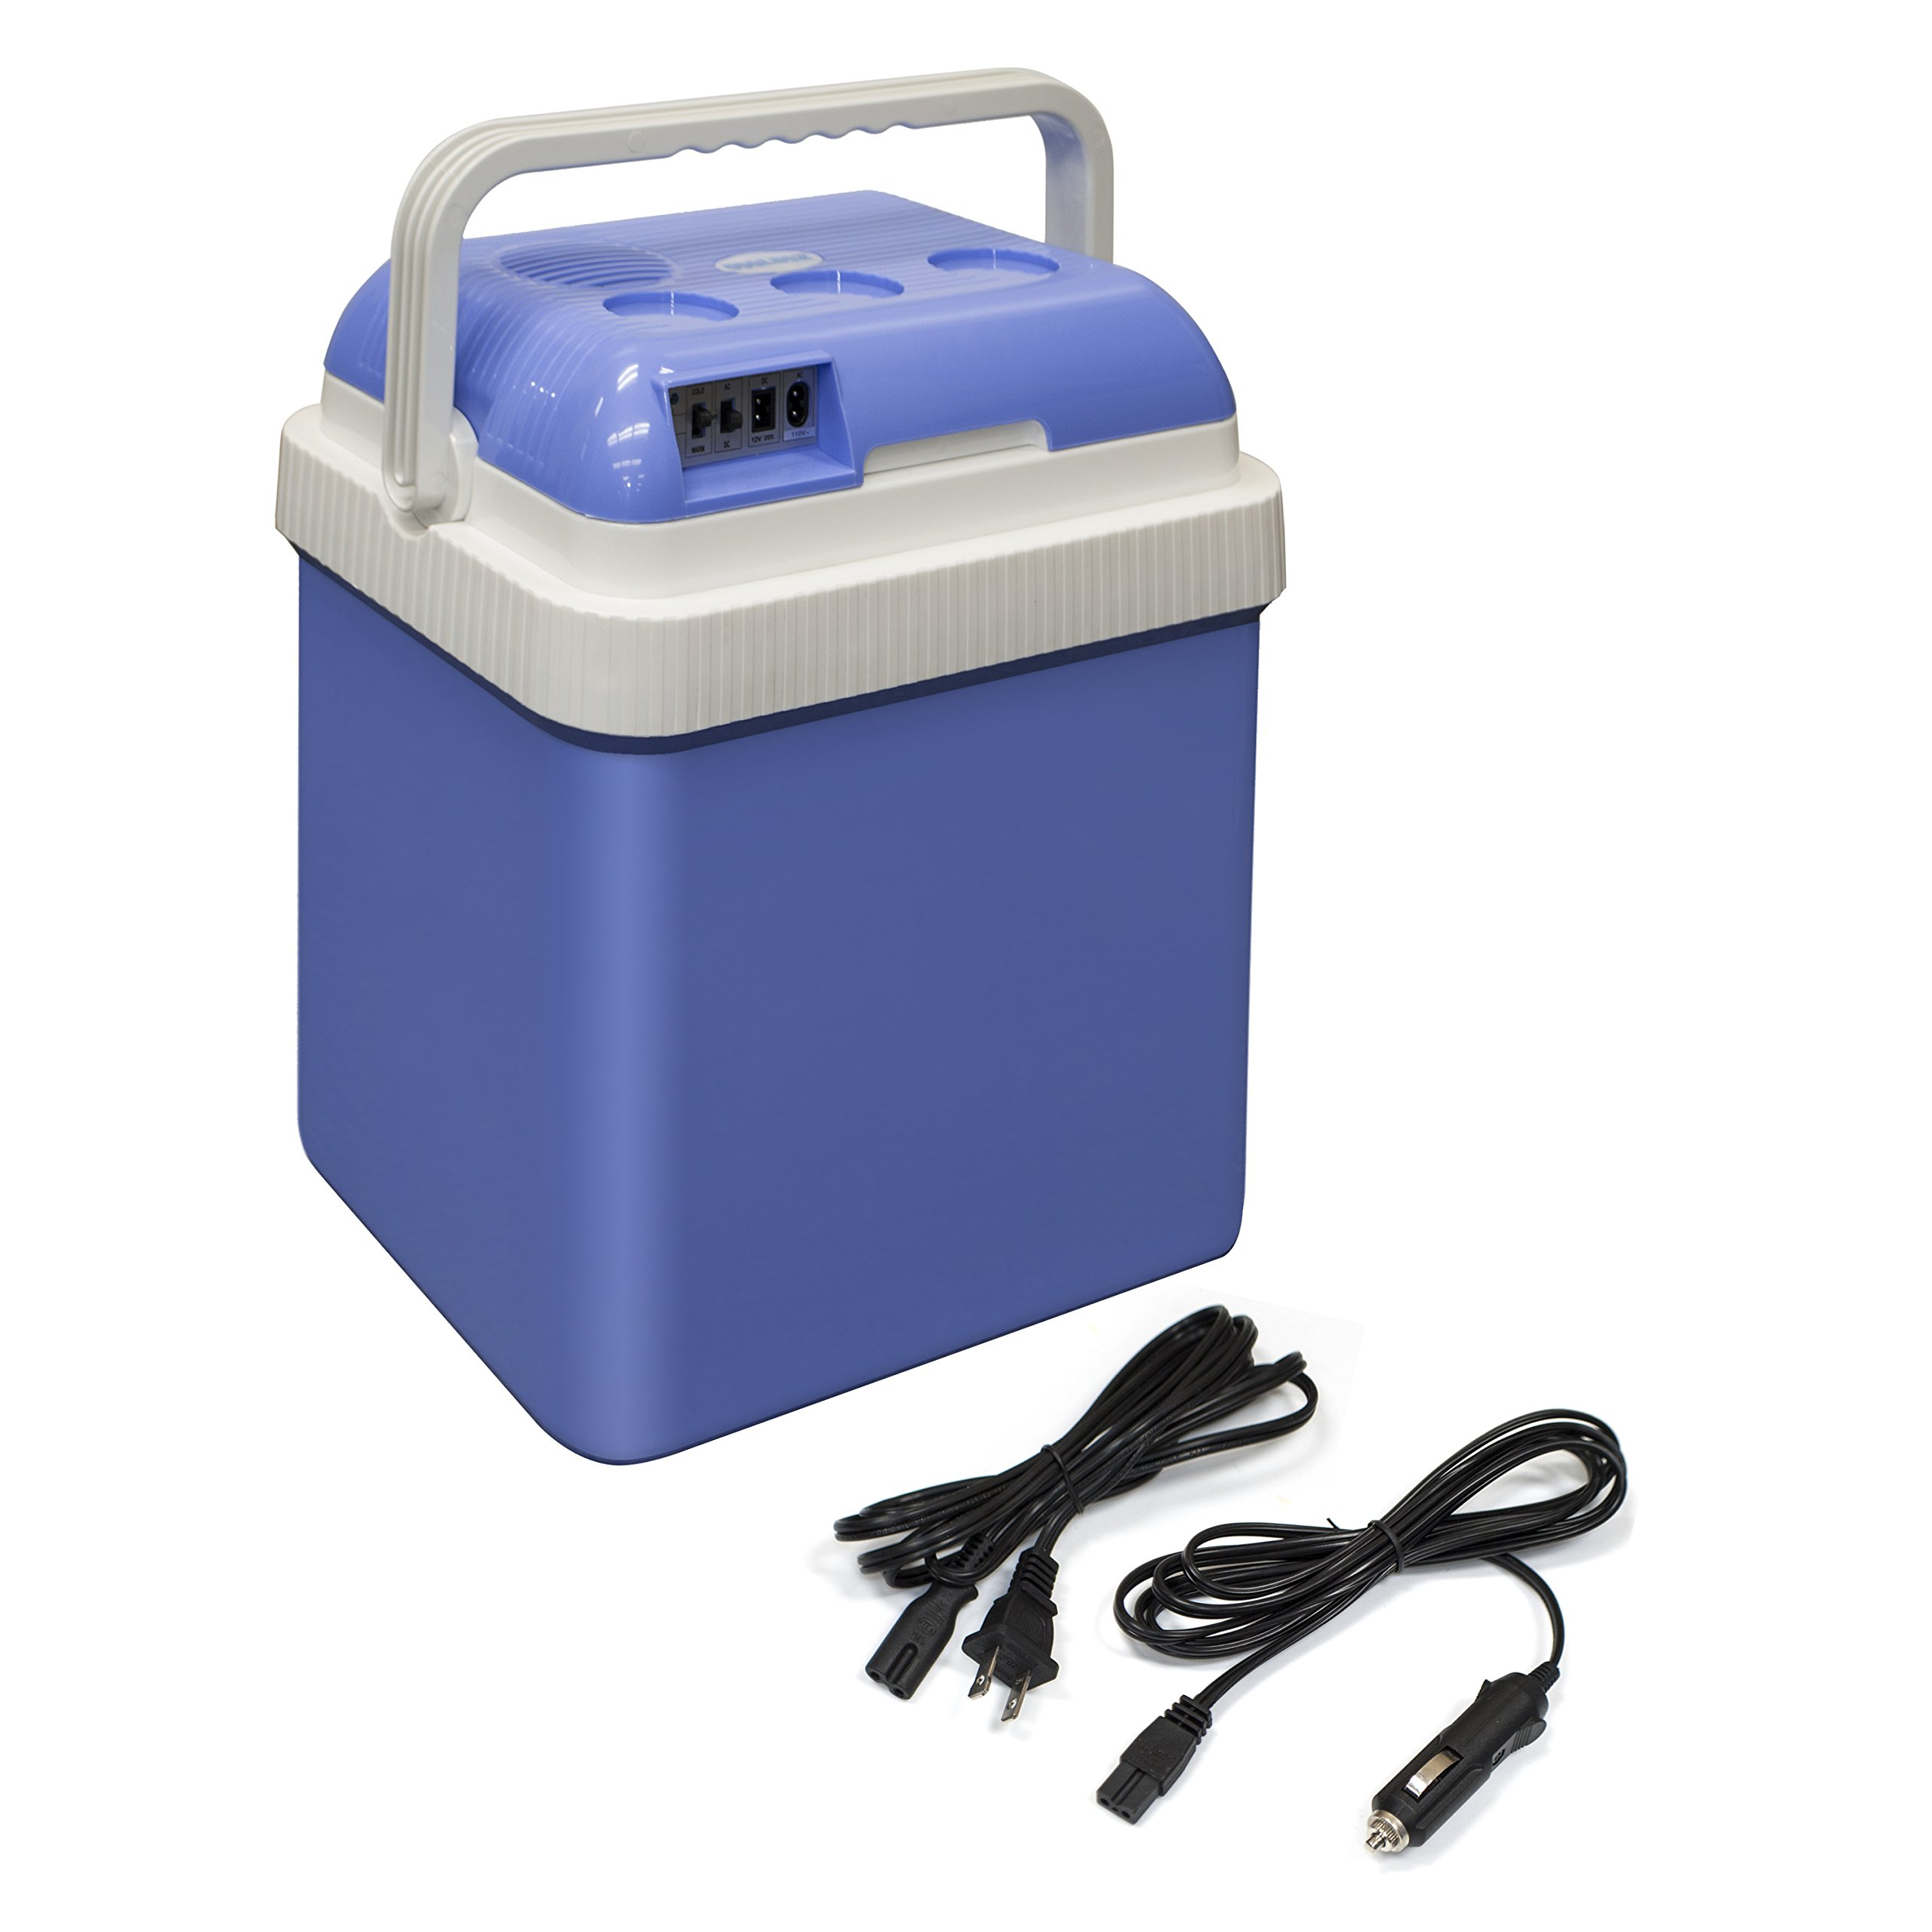 ALEKO CARFR24BL Portable Electric Cooler and Warmer Car Refrigerator Travel AC DC Power 24 Liter Capacity Light Blue